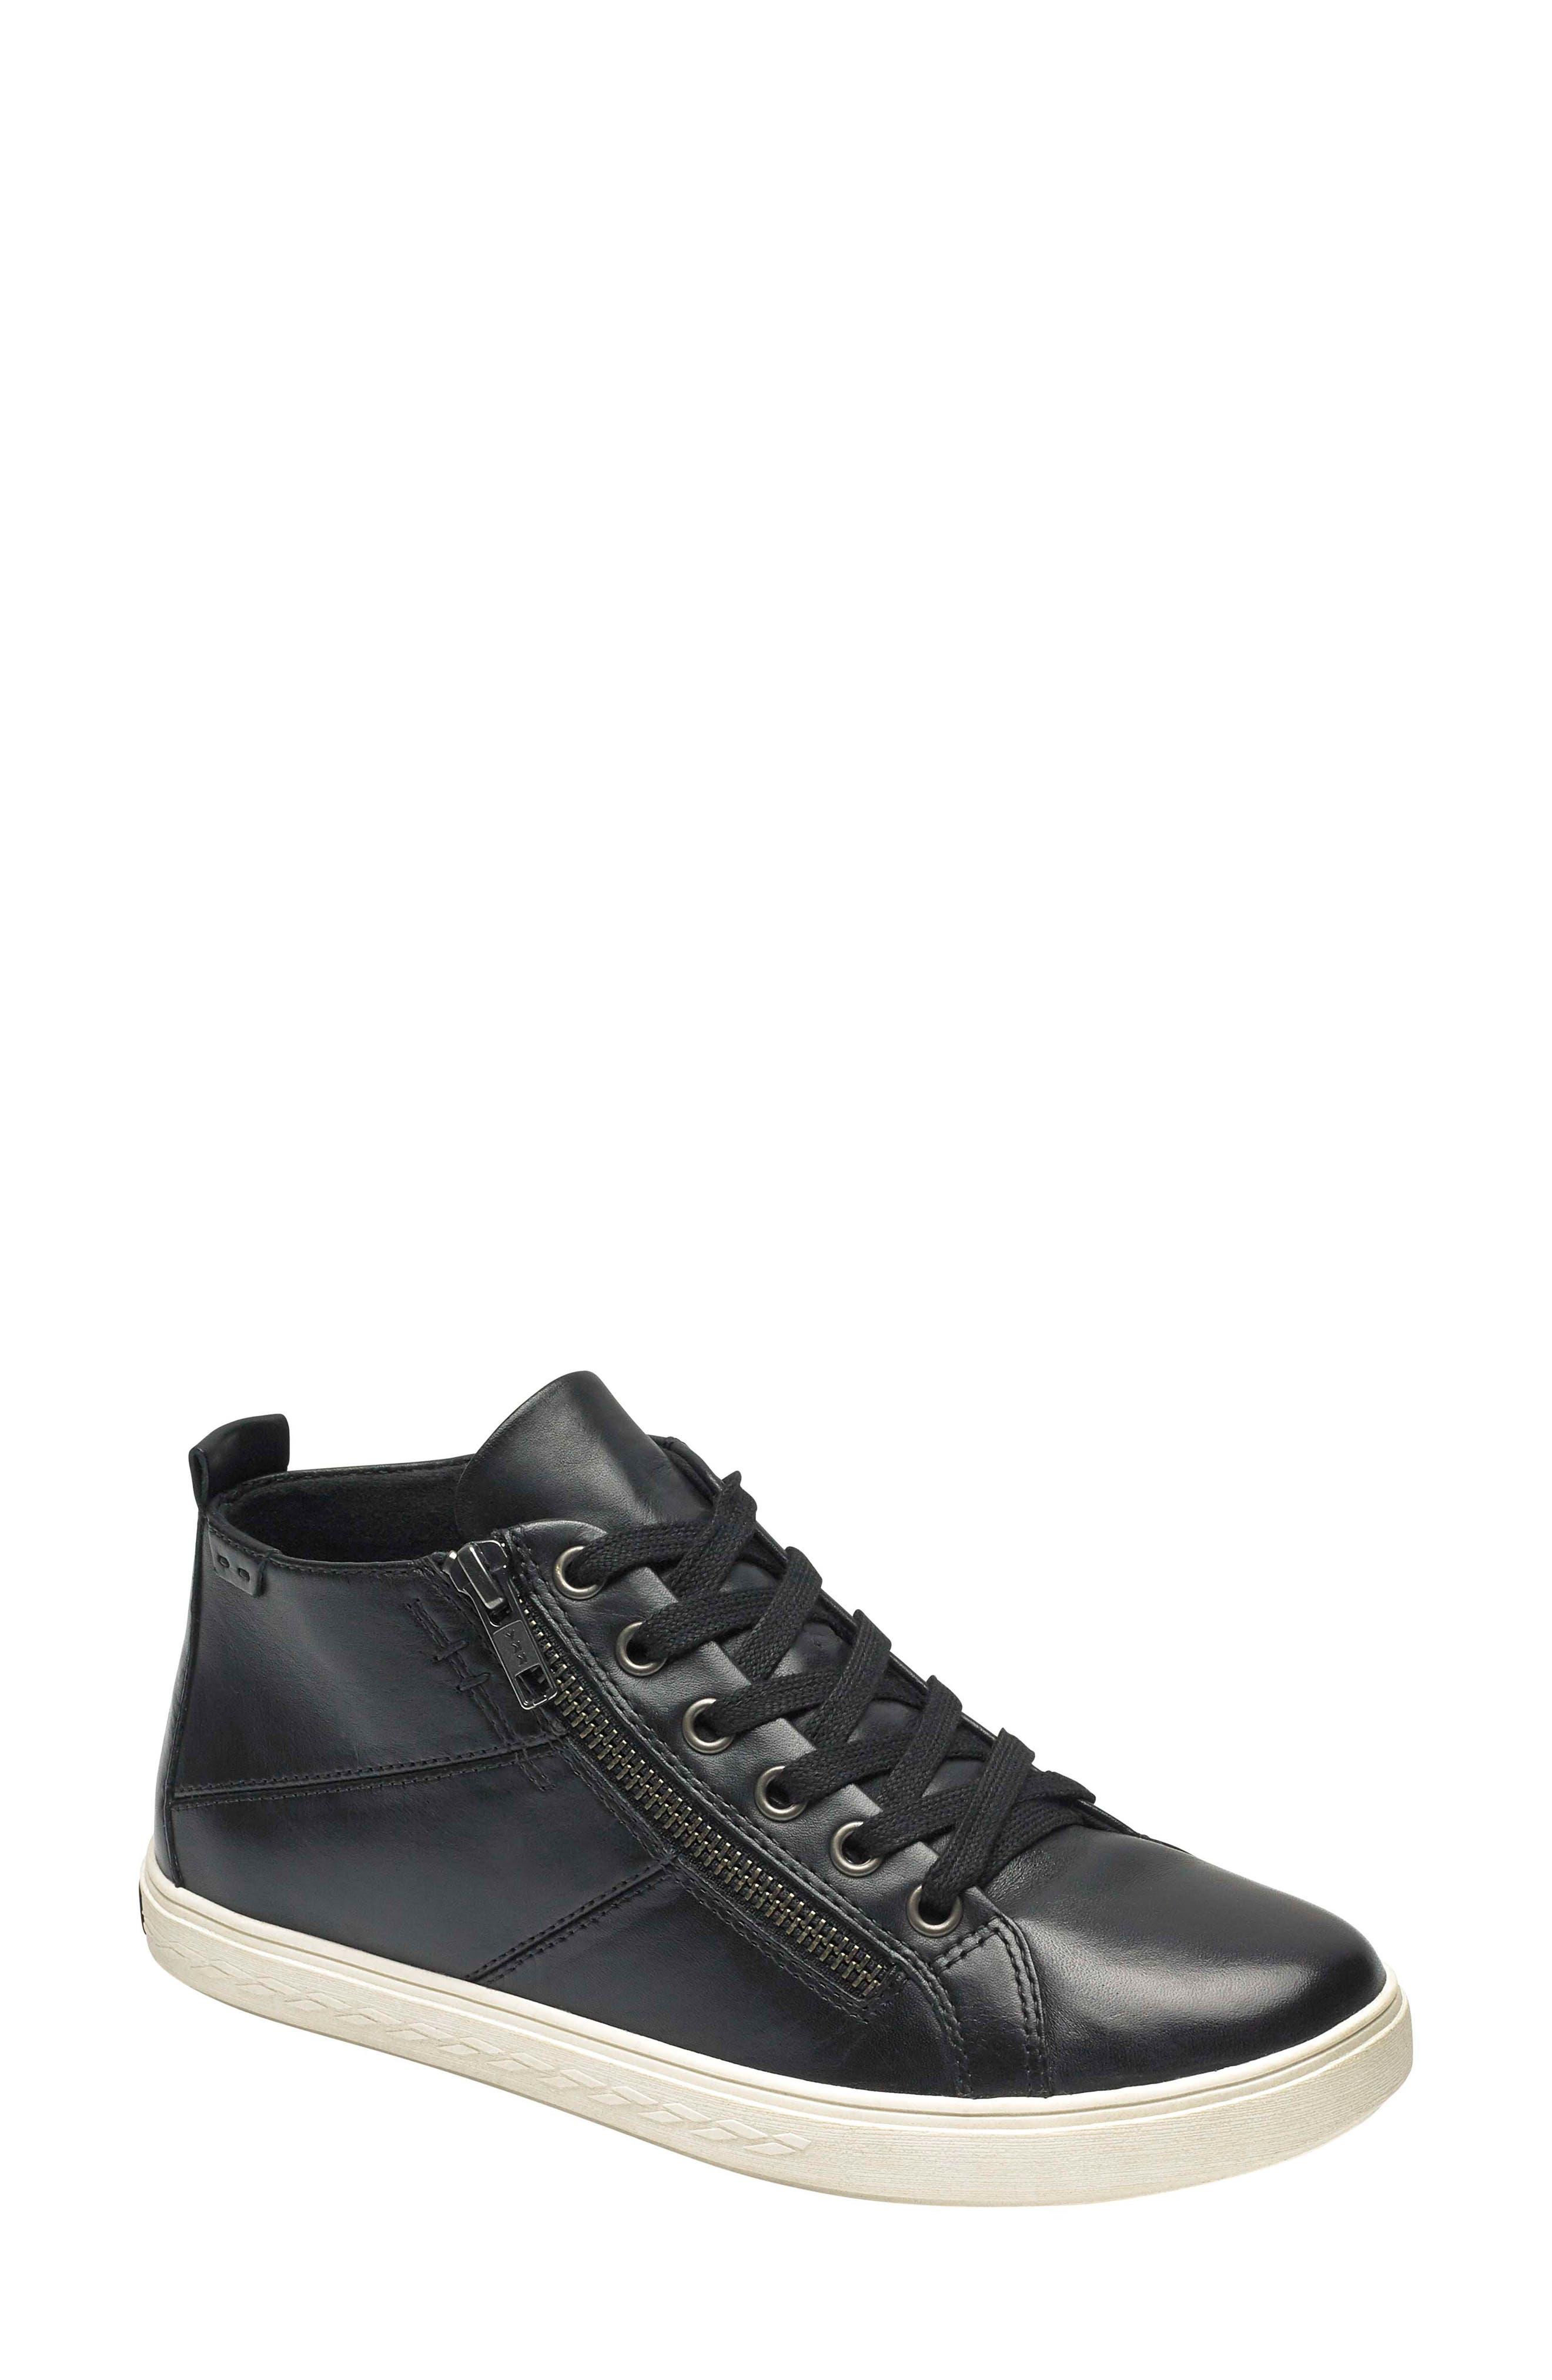 Rockport Cobb Hill Willa High Top Sneaker- Black